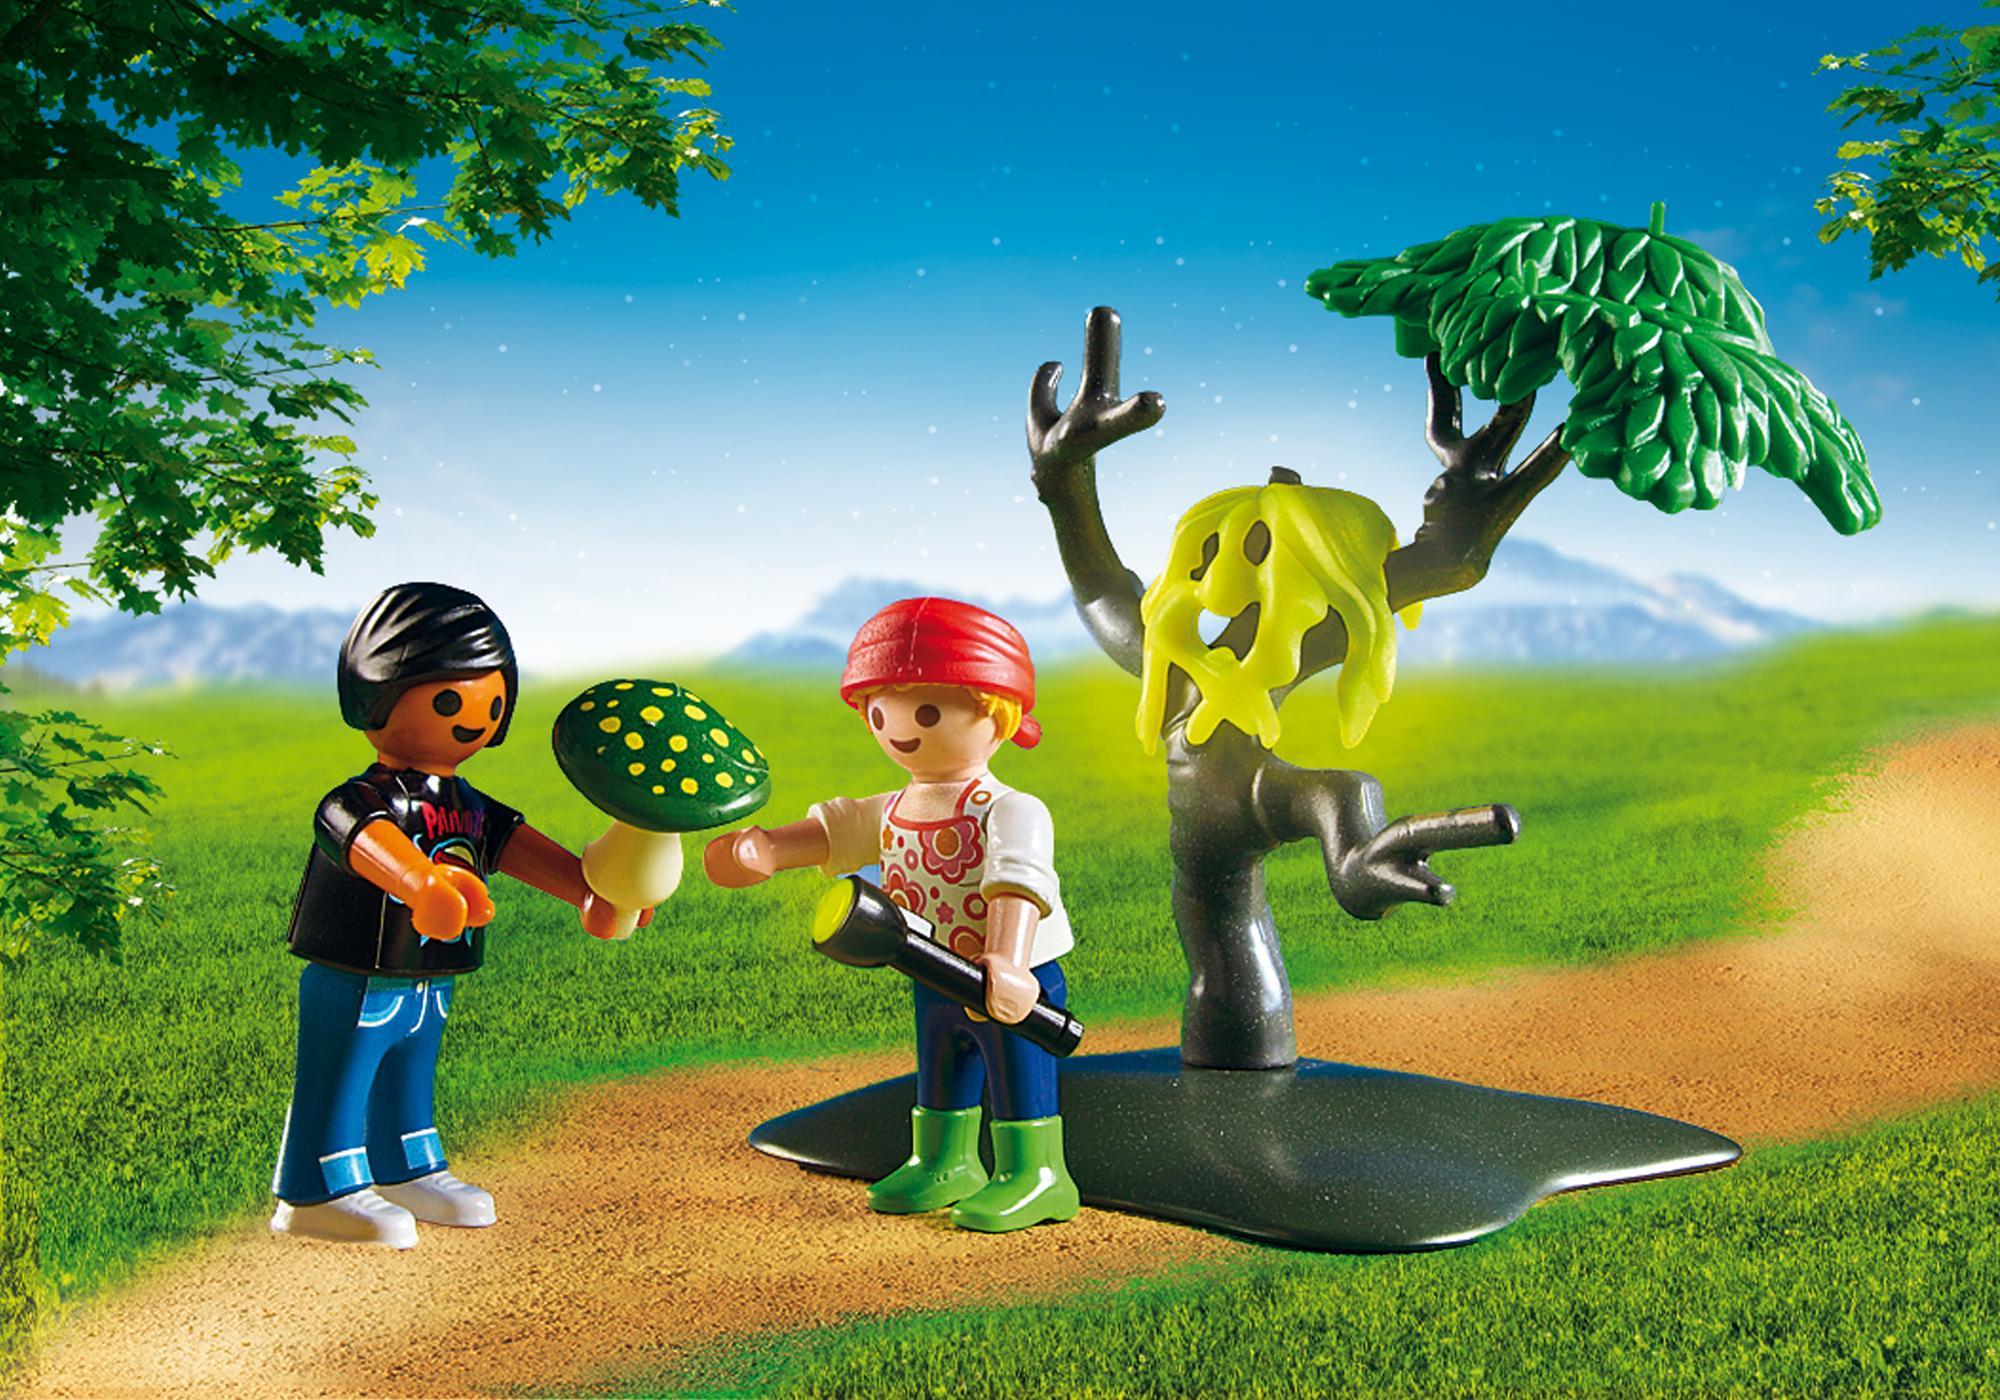 http://media.playmobil.com/i/playmobil/6891_product_extra1